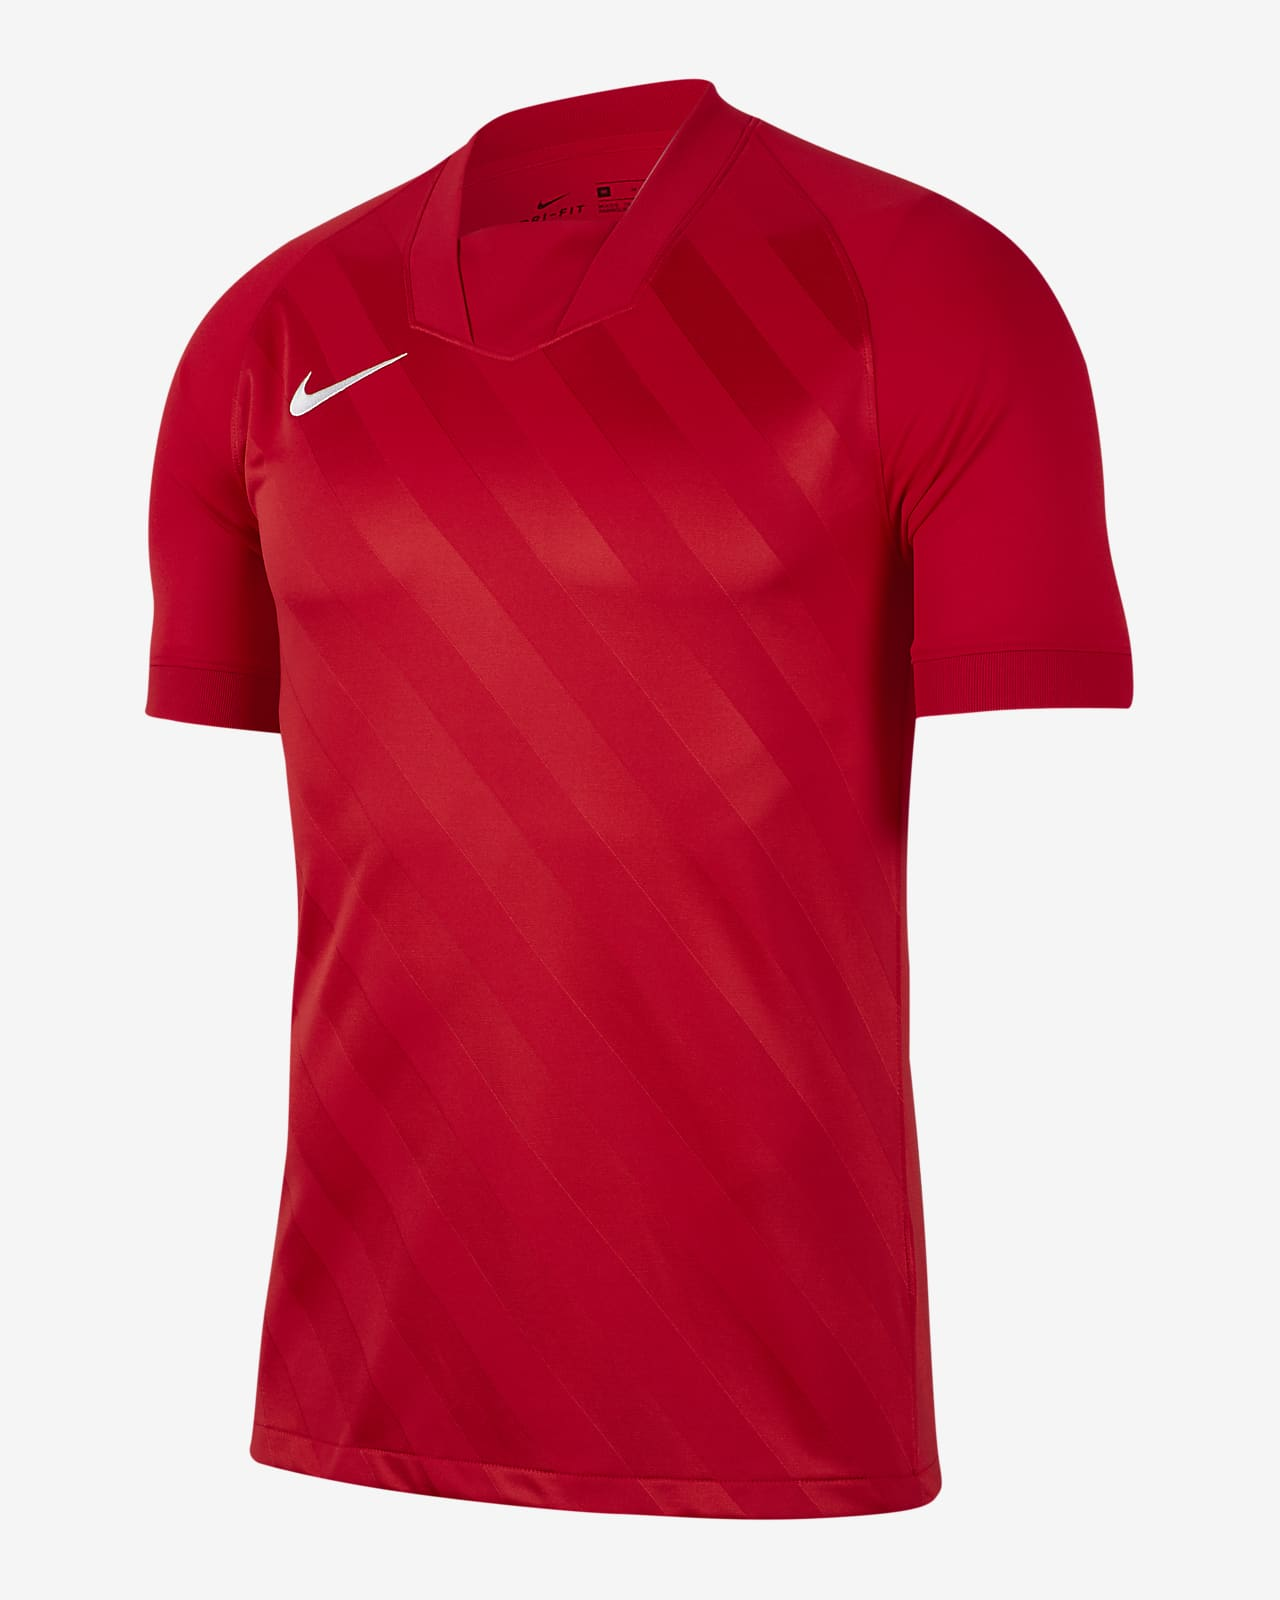 Nike Dri-FIT Challenge 3 férfi futballmez